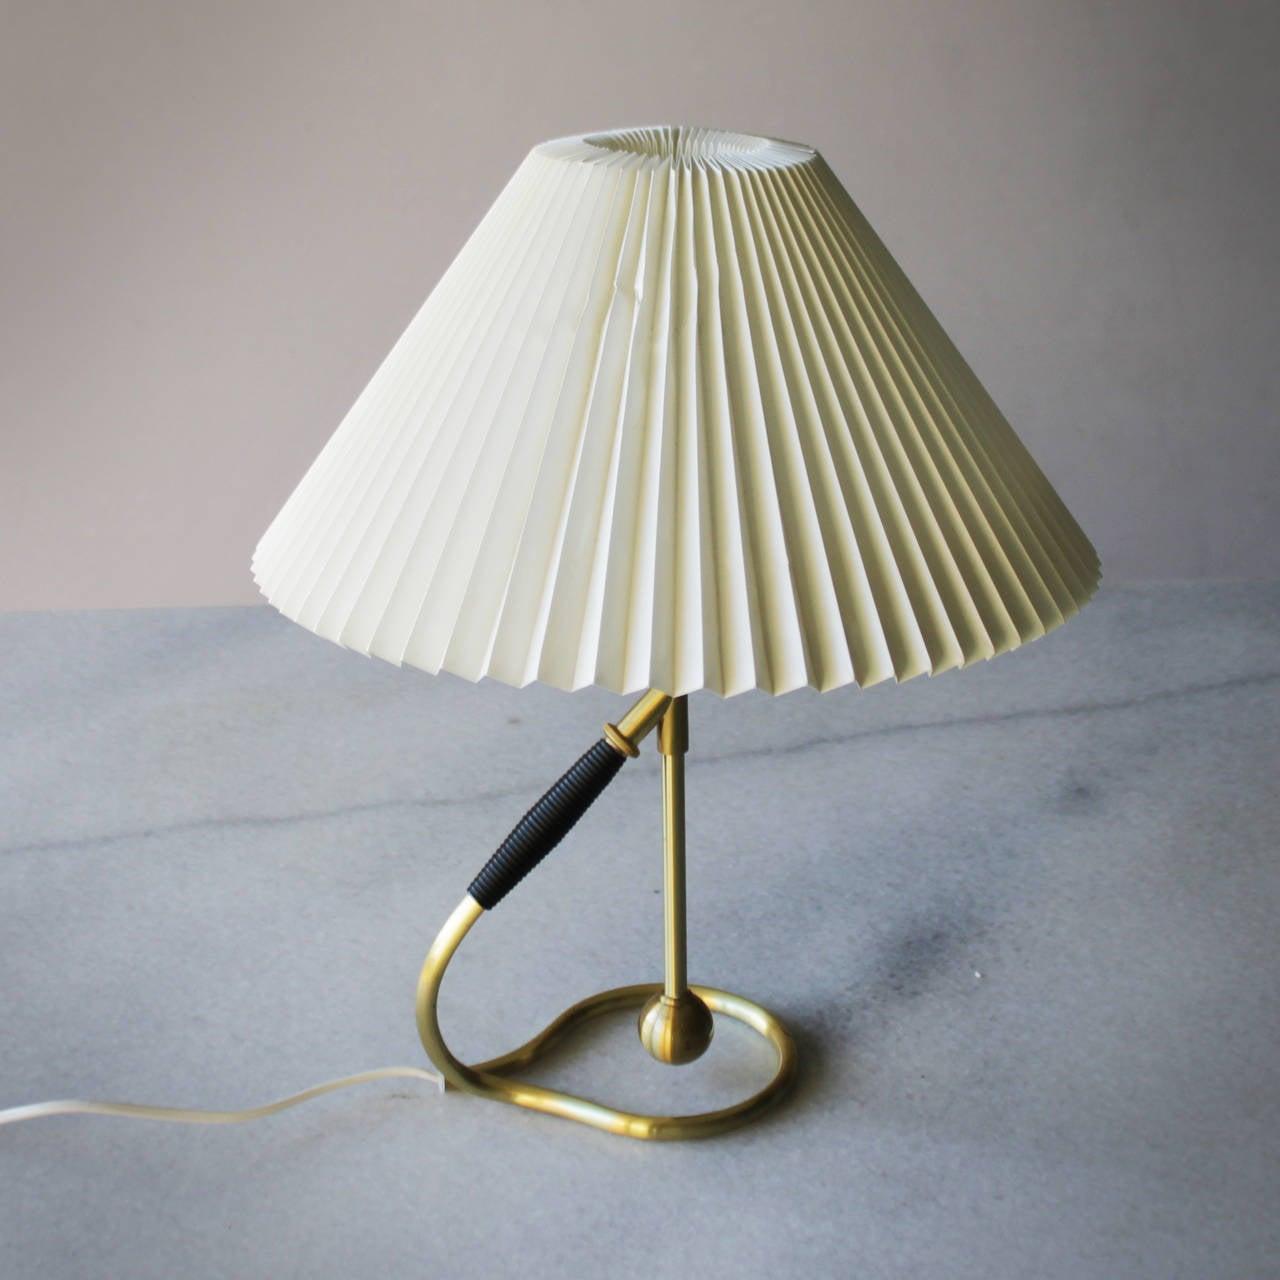 klint lighting. Pair Of Wall Or Table Lamps Model 306 Design By Kaare Klint For Le  Denmark Klint Lighting S